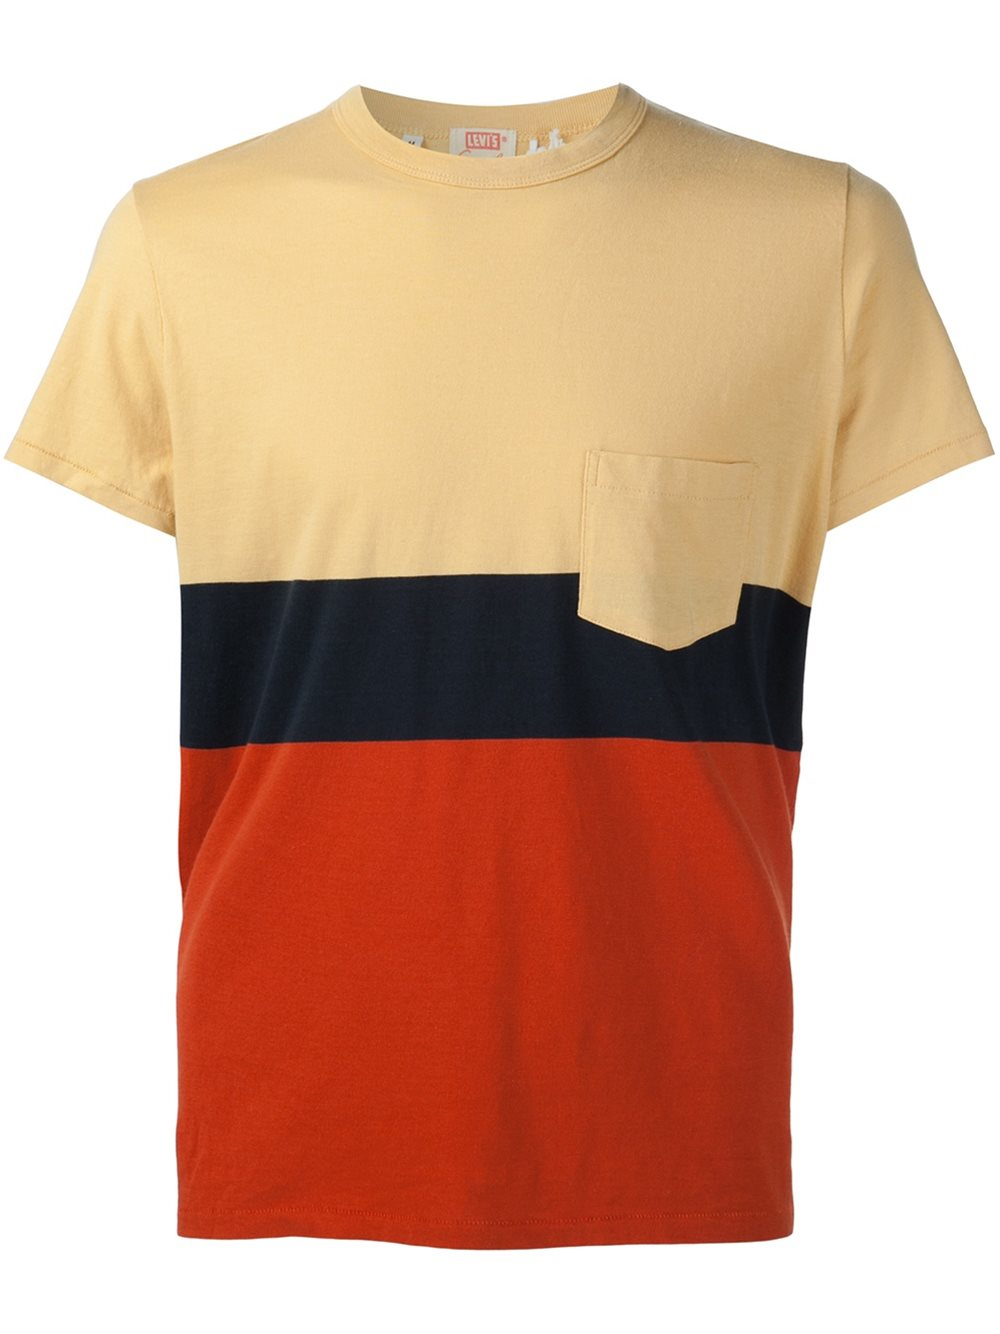 Lyst levi 39 s colour block t shirt in black for men for Mens black levi shirt